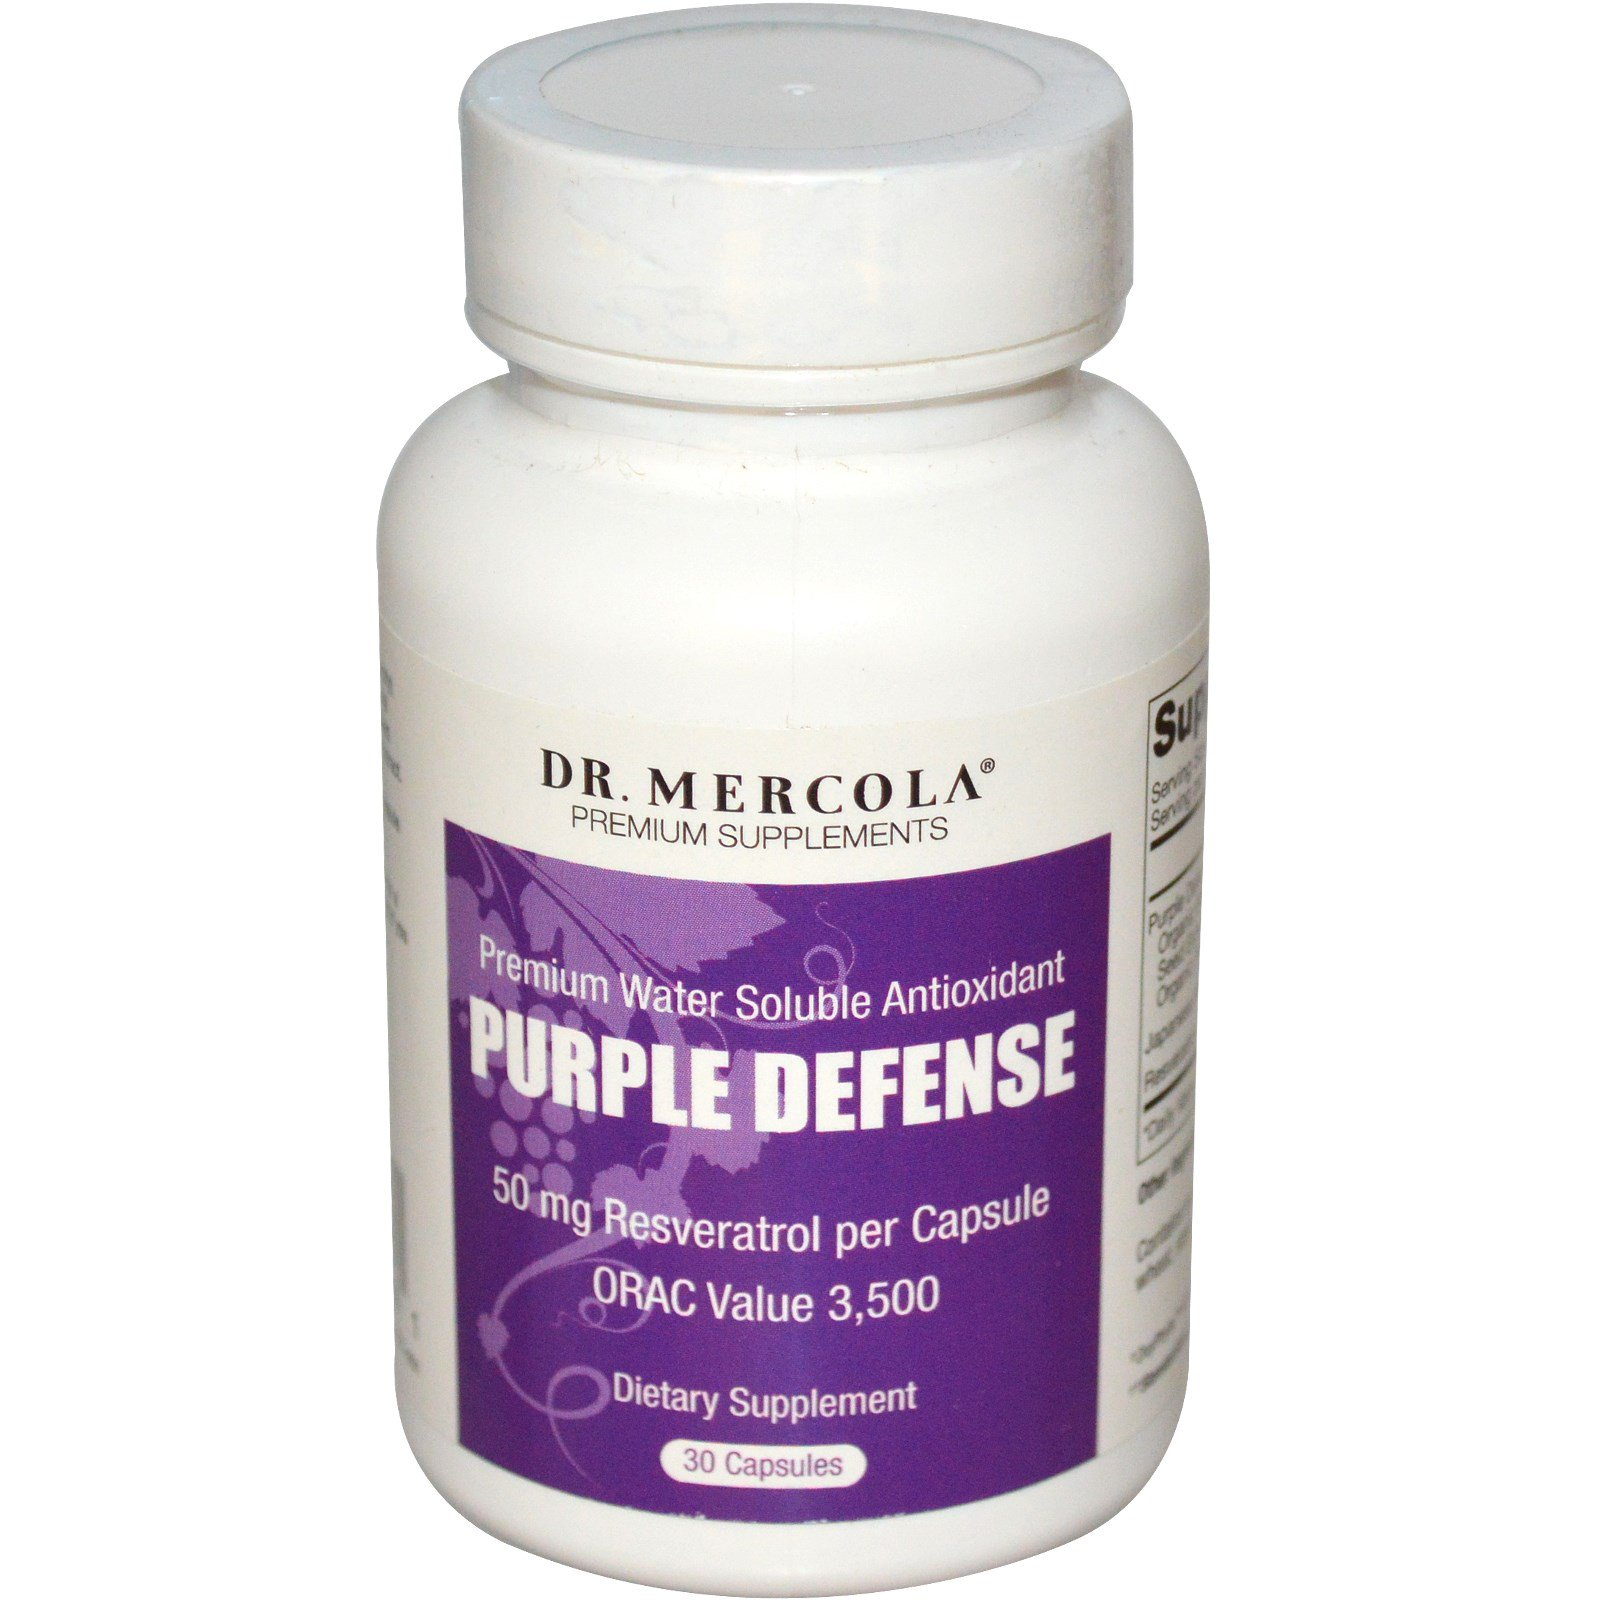 Image of Dr. Mercola, Purple Defense, Premium Water Soluble Antioxidant, 30 Capsules 0813006011341